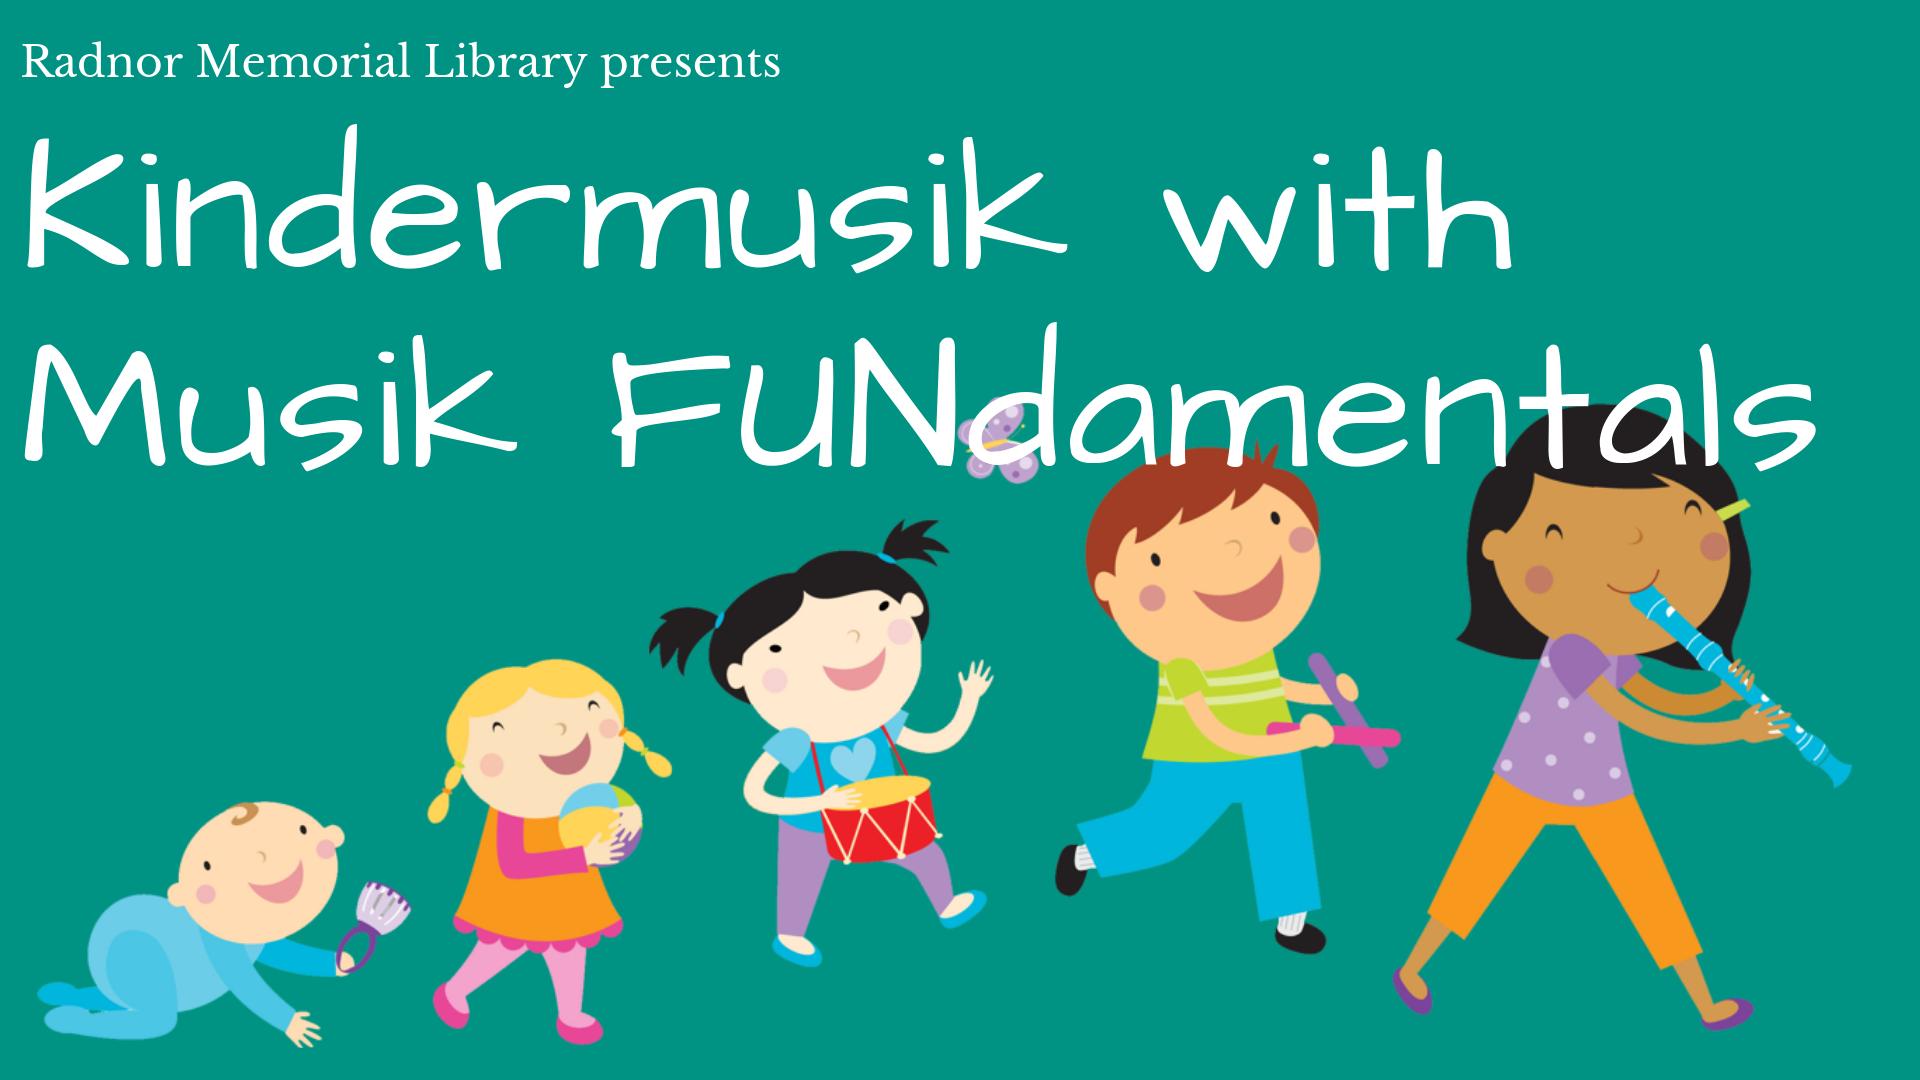 Kindermusik presented by Musik FUNdamentals